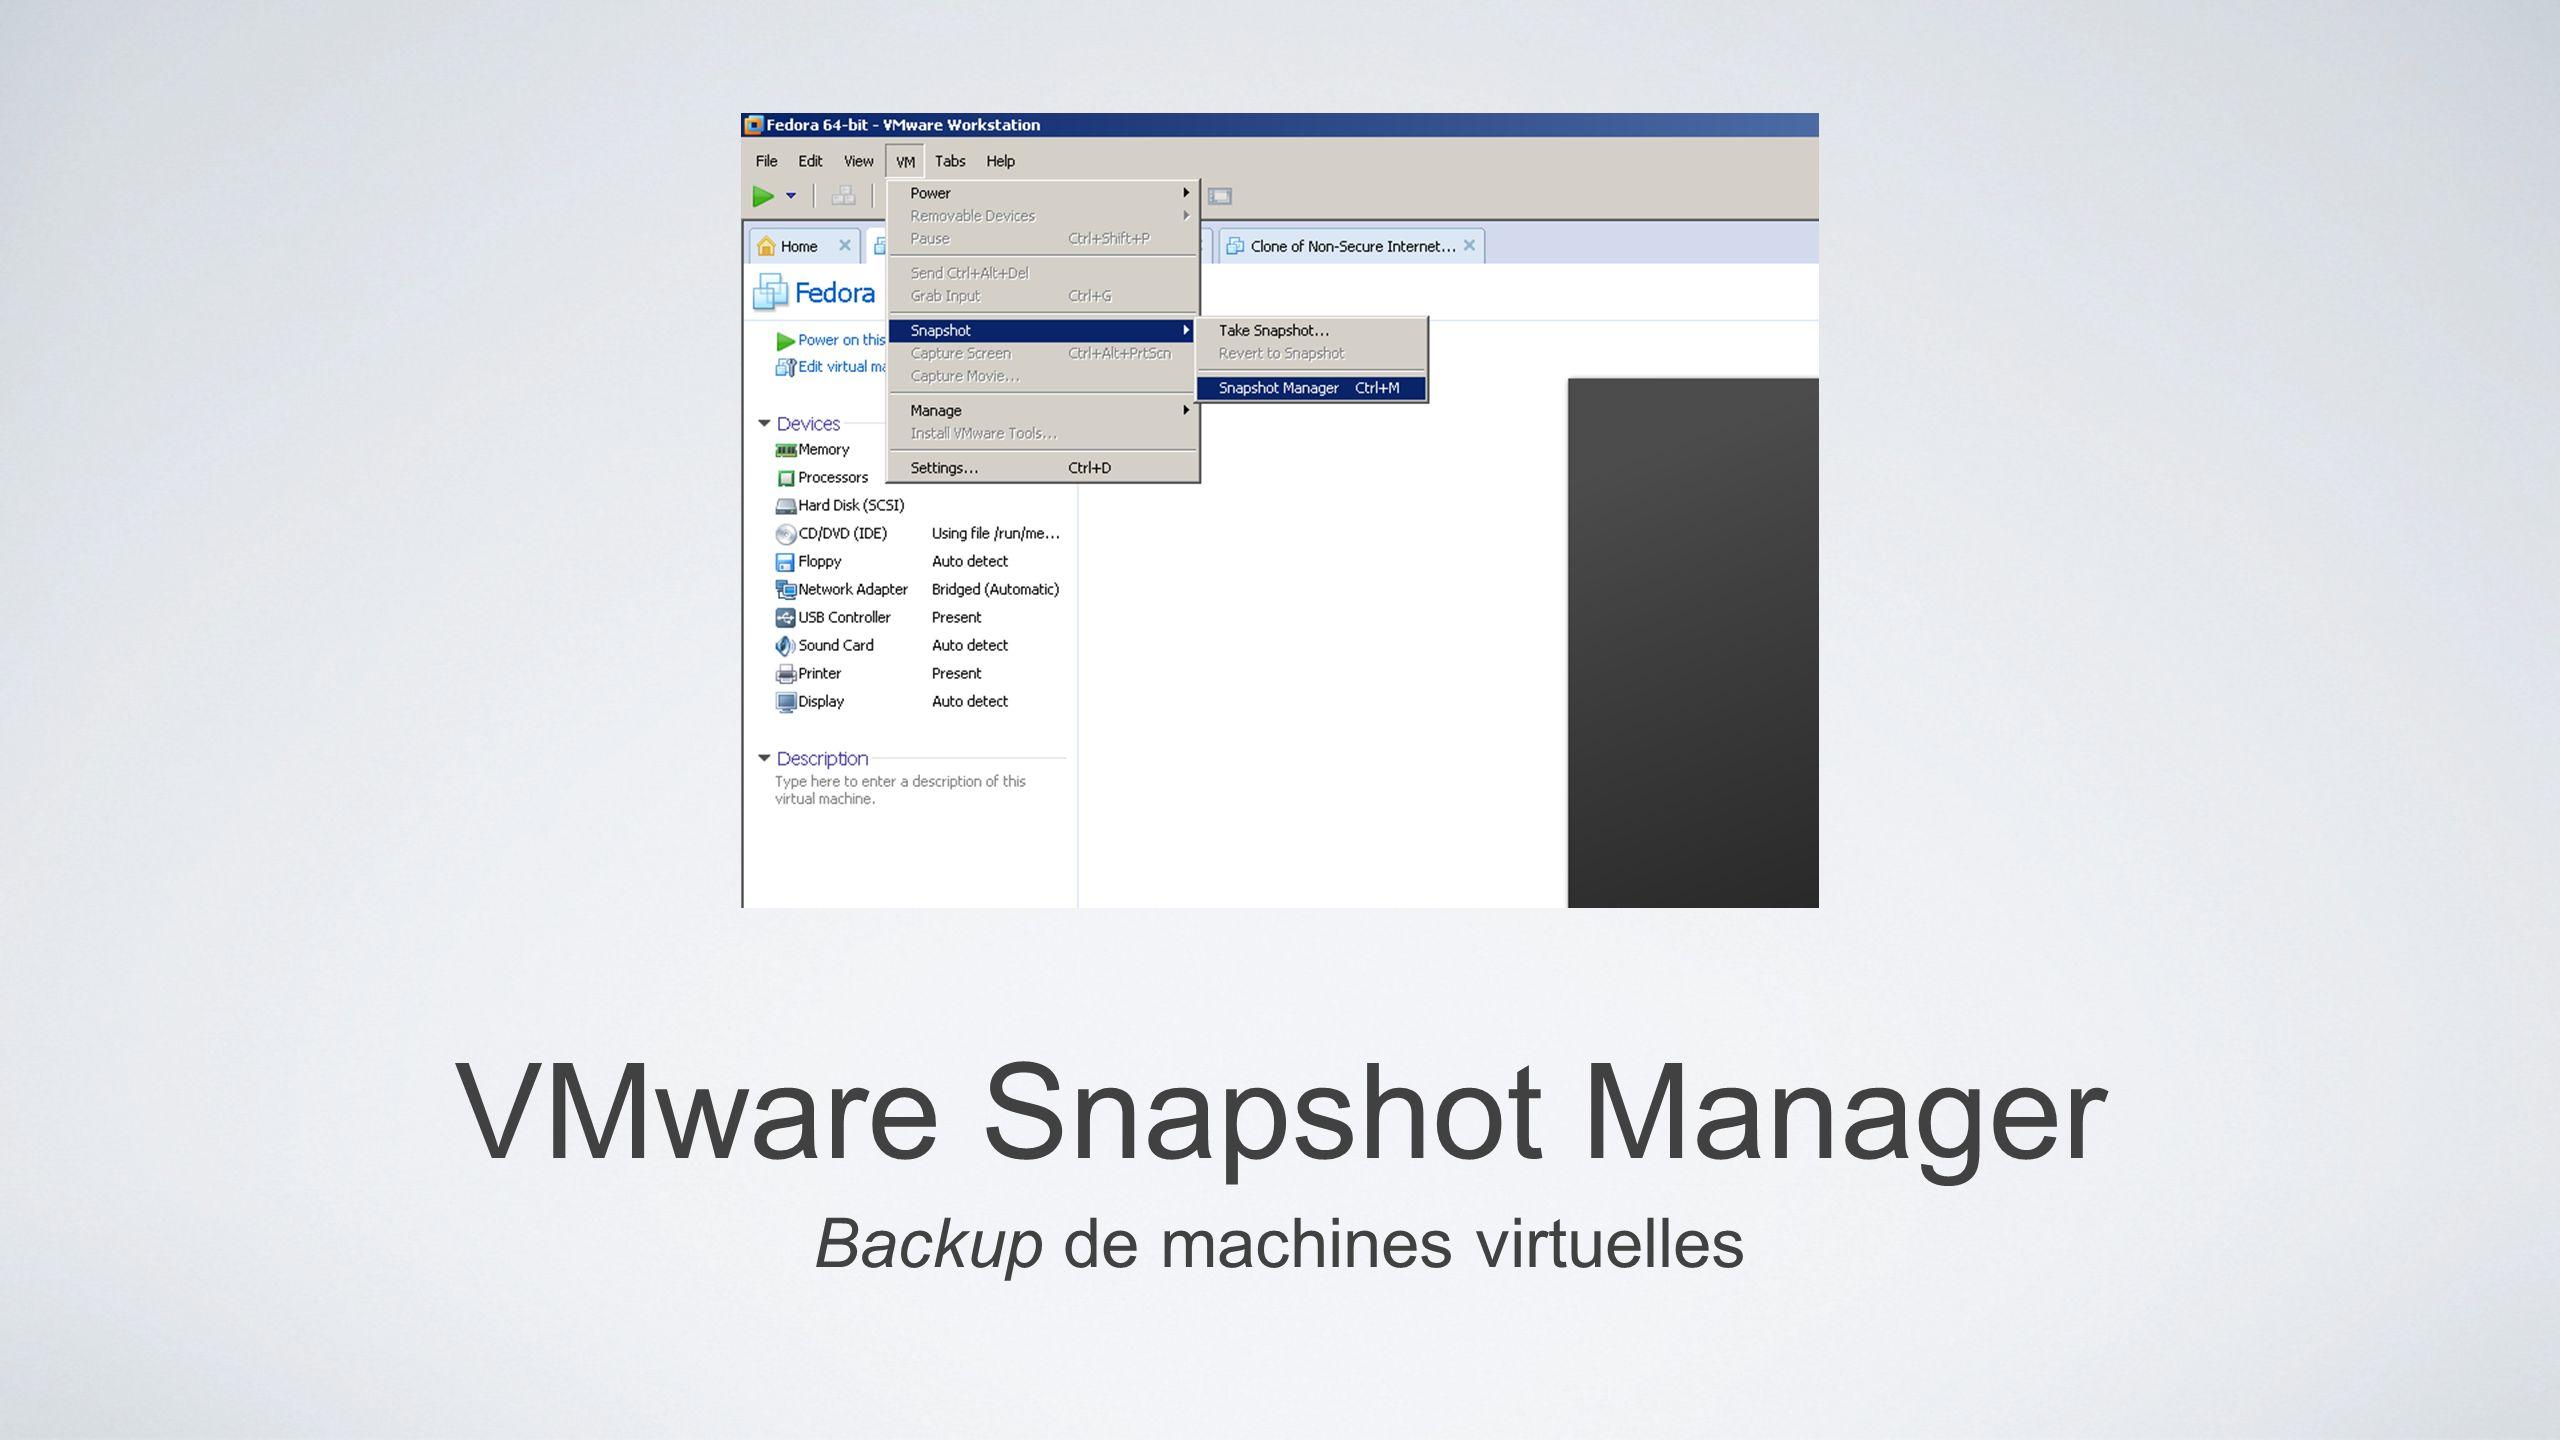 VMware Snapshot Manager Backup de machines virtuelles